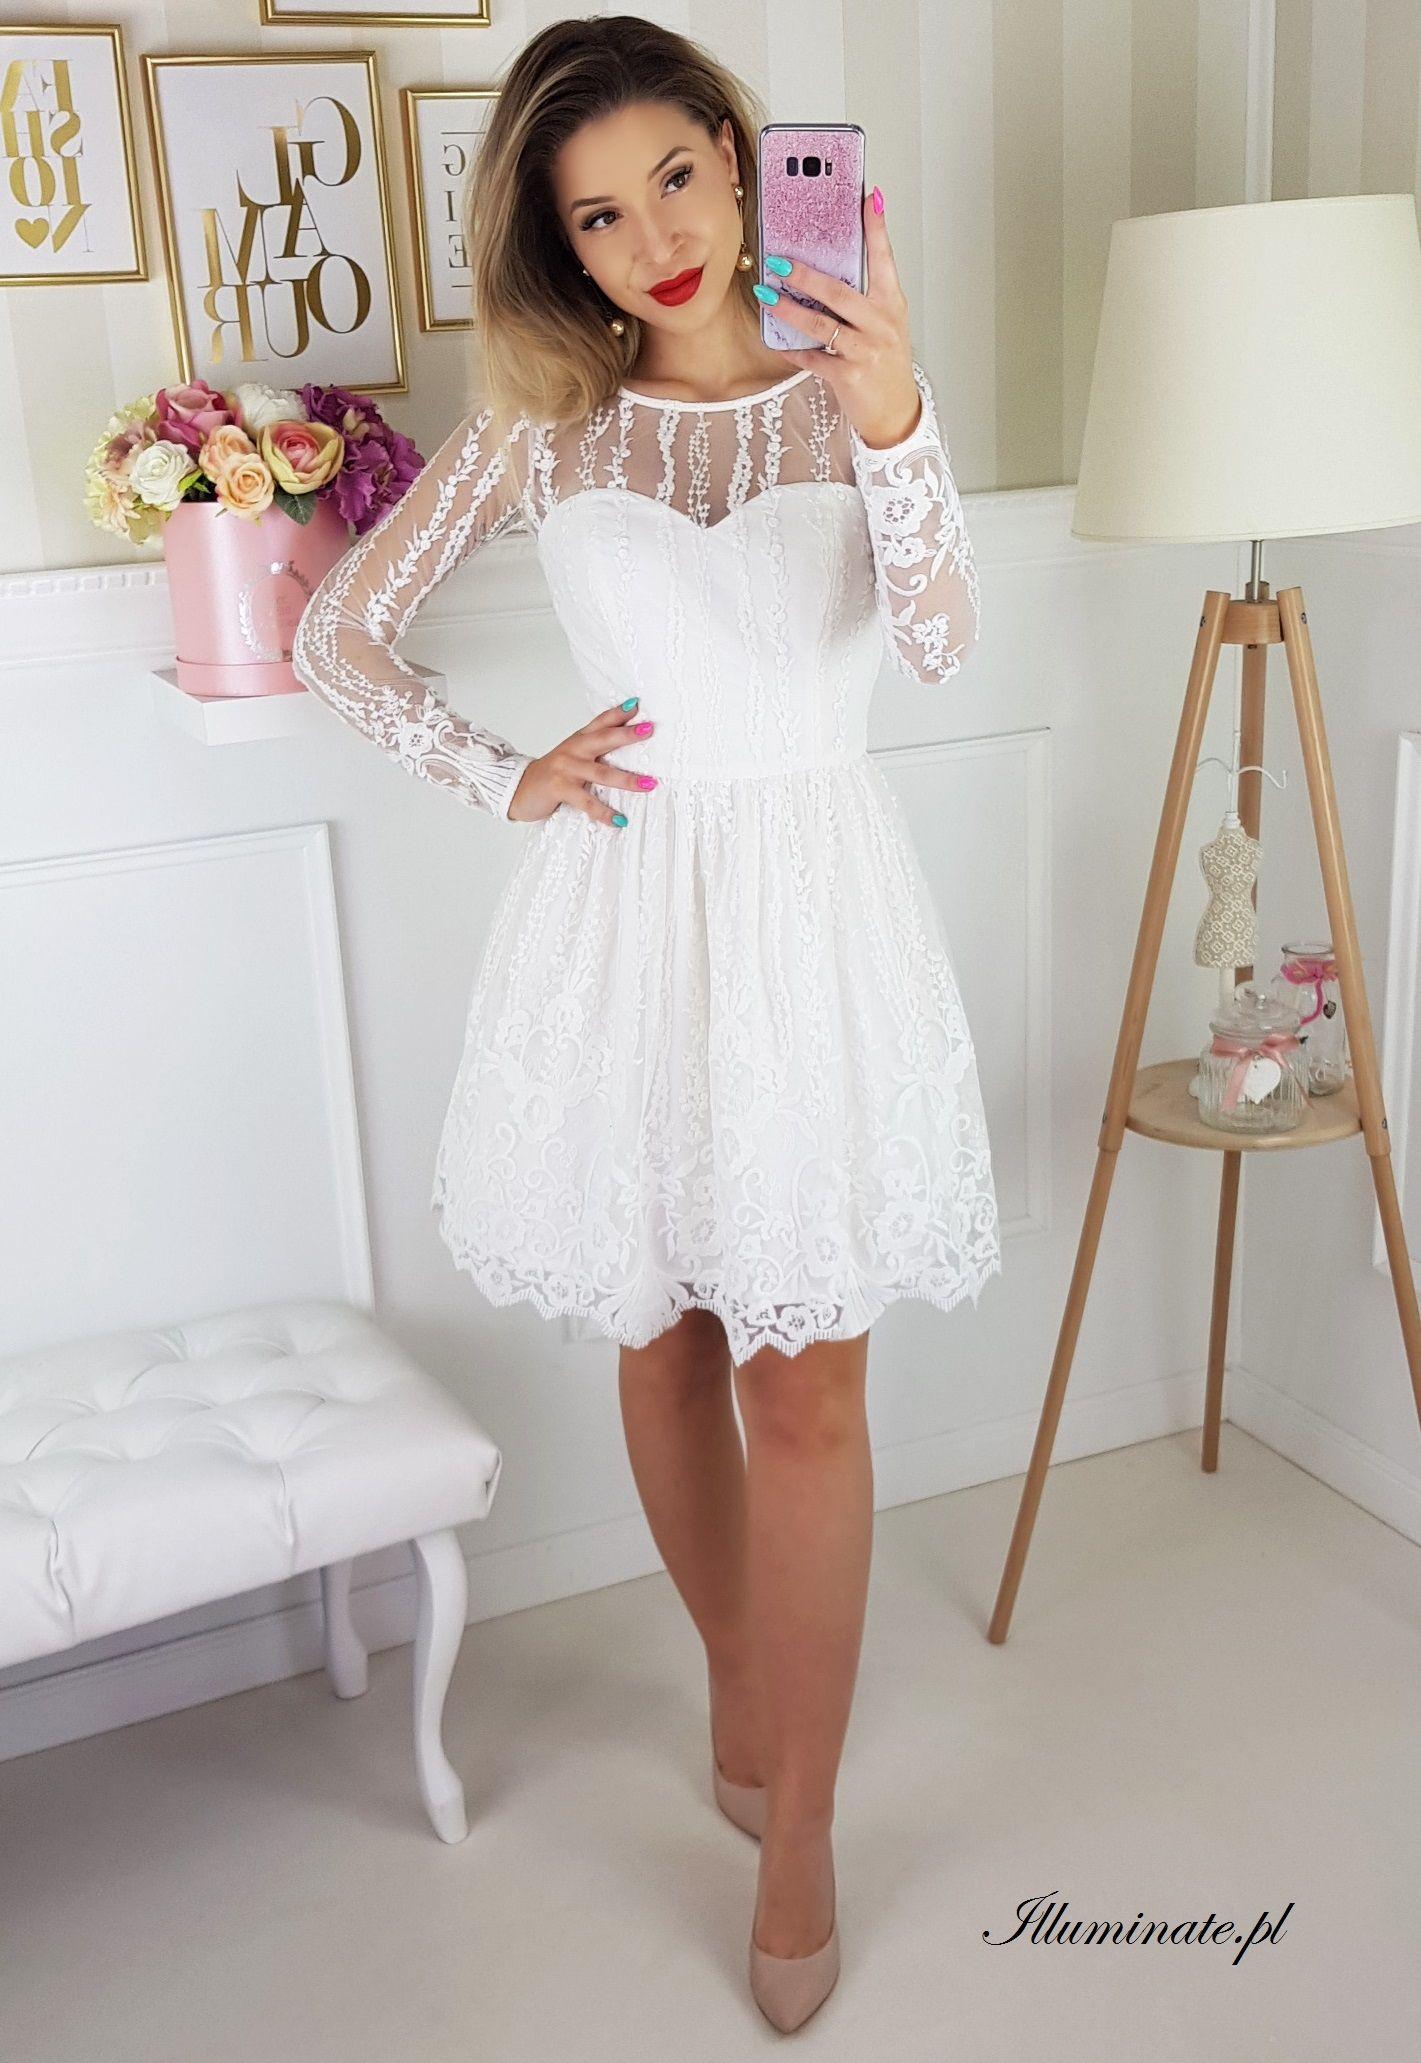 fac3dacb21 Biala tiulowa sukienka na poprawiny Allison